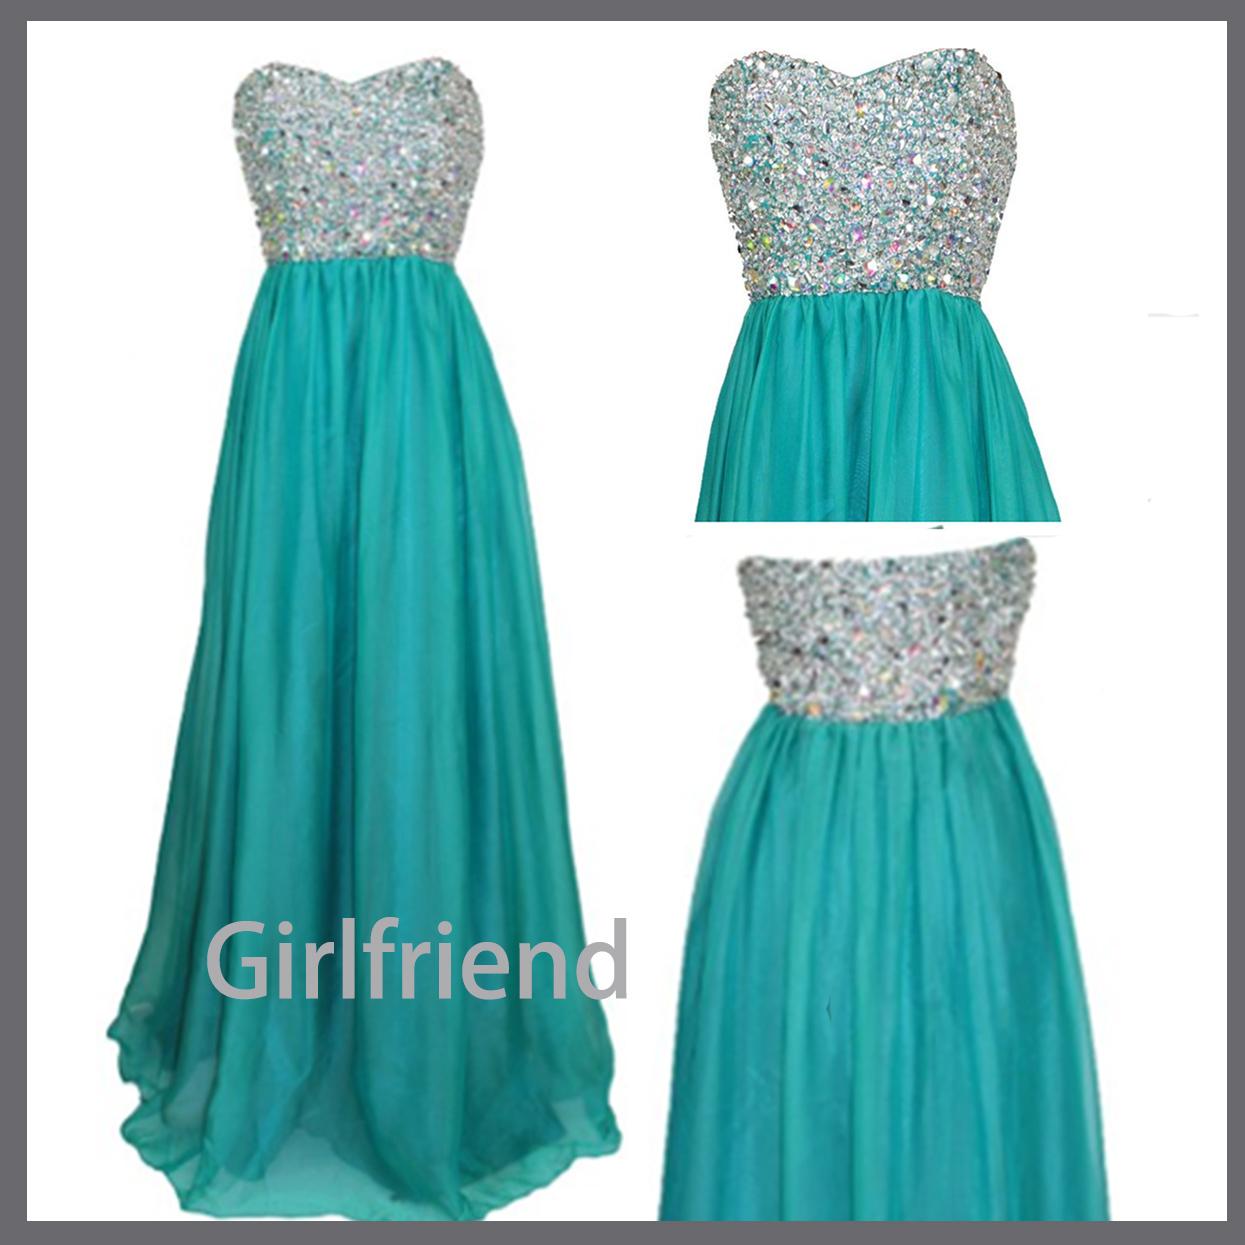 Tumblr Prom Dresses 2013 | Dress images